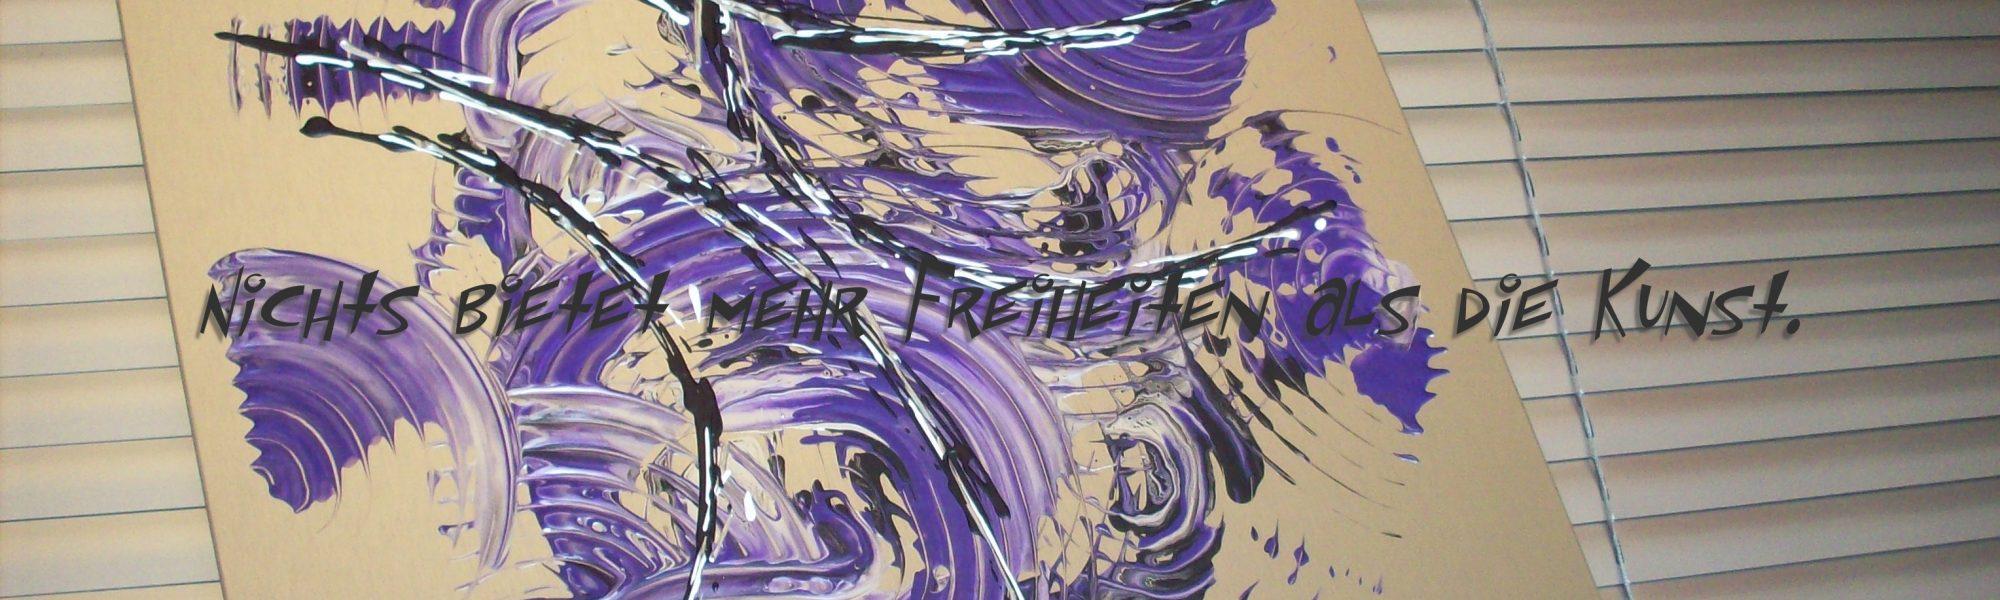 Slide Startseite Alu violett